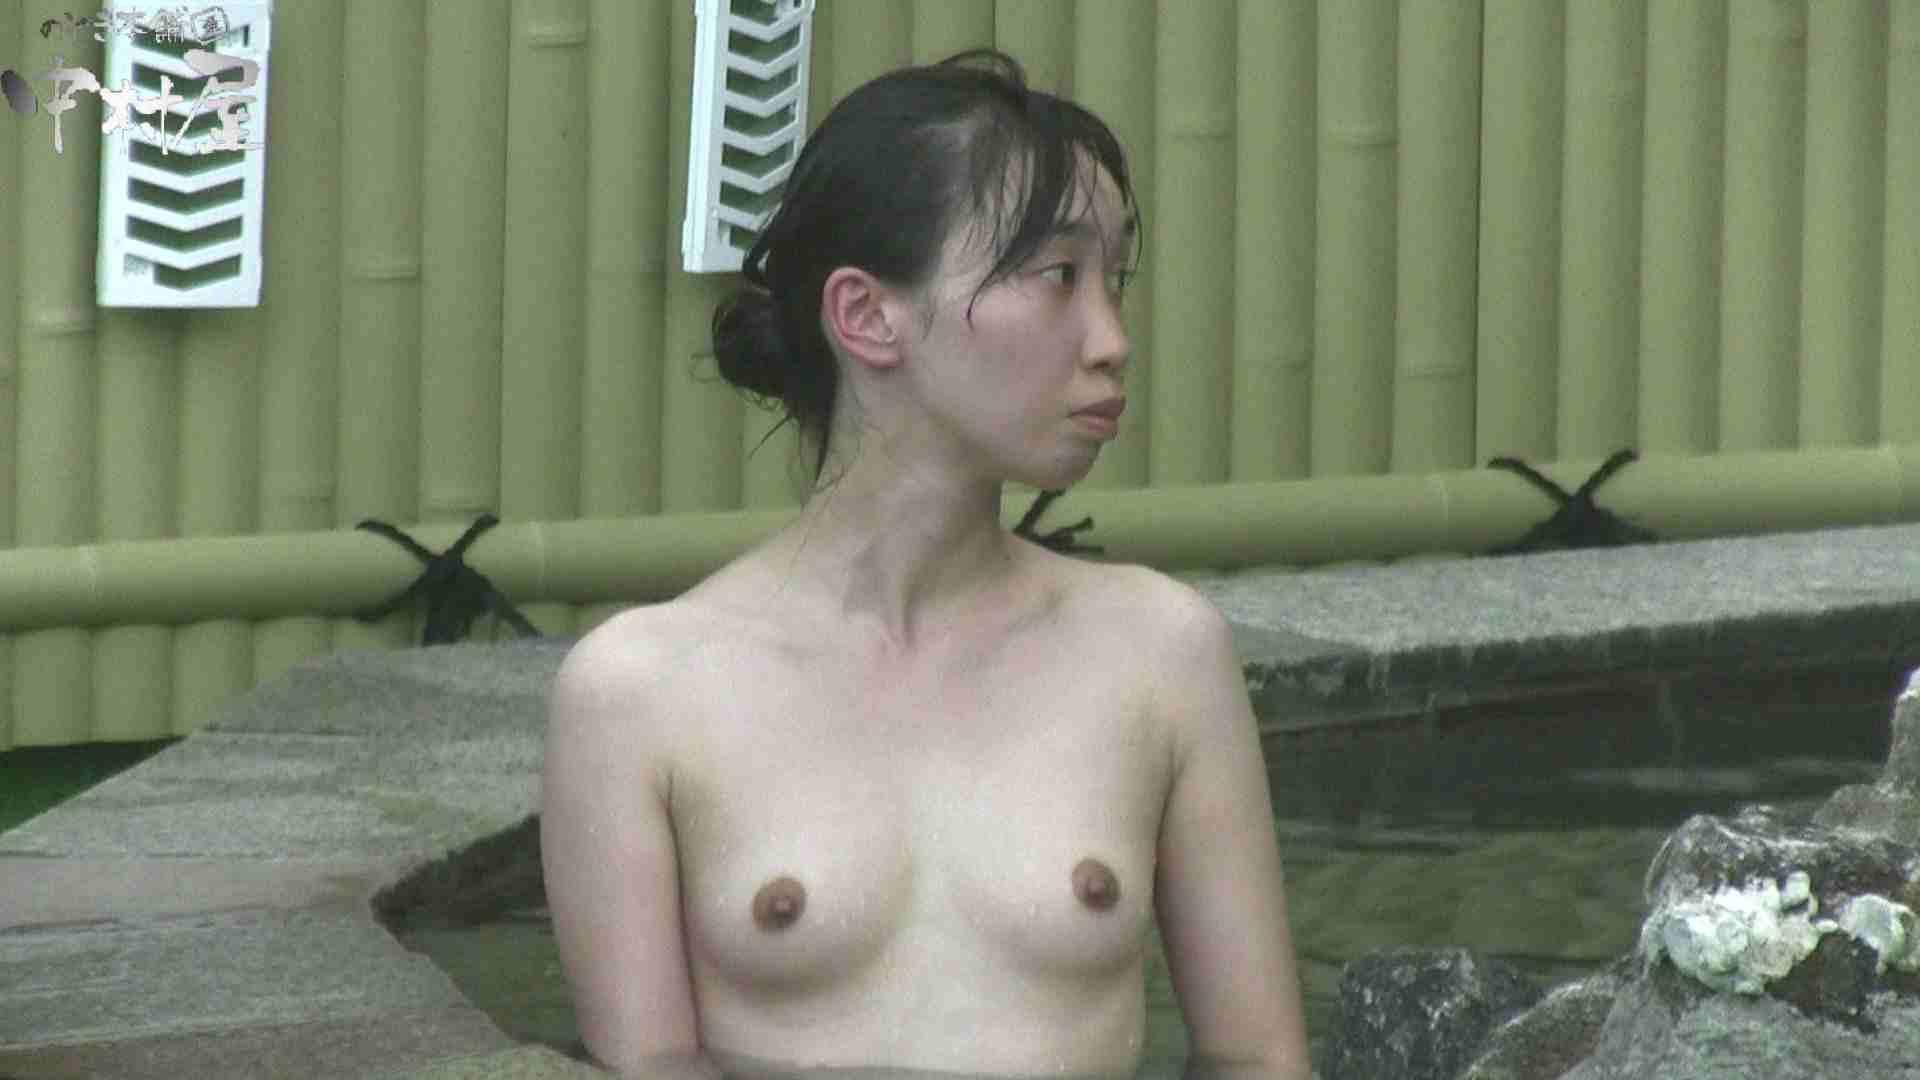 Aquaな露天風呂Vol.910 盗撮シリーズ | 露天風呂編  84PIX 33